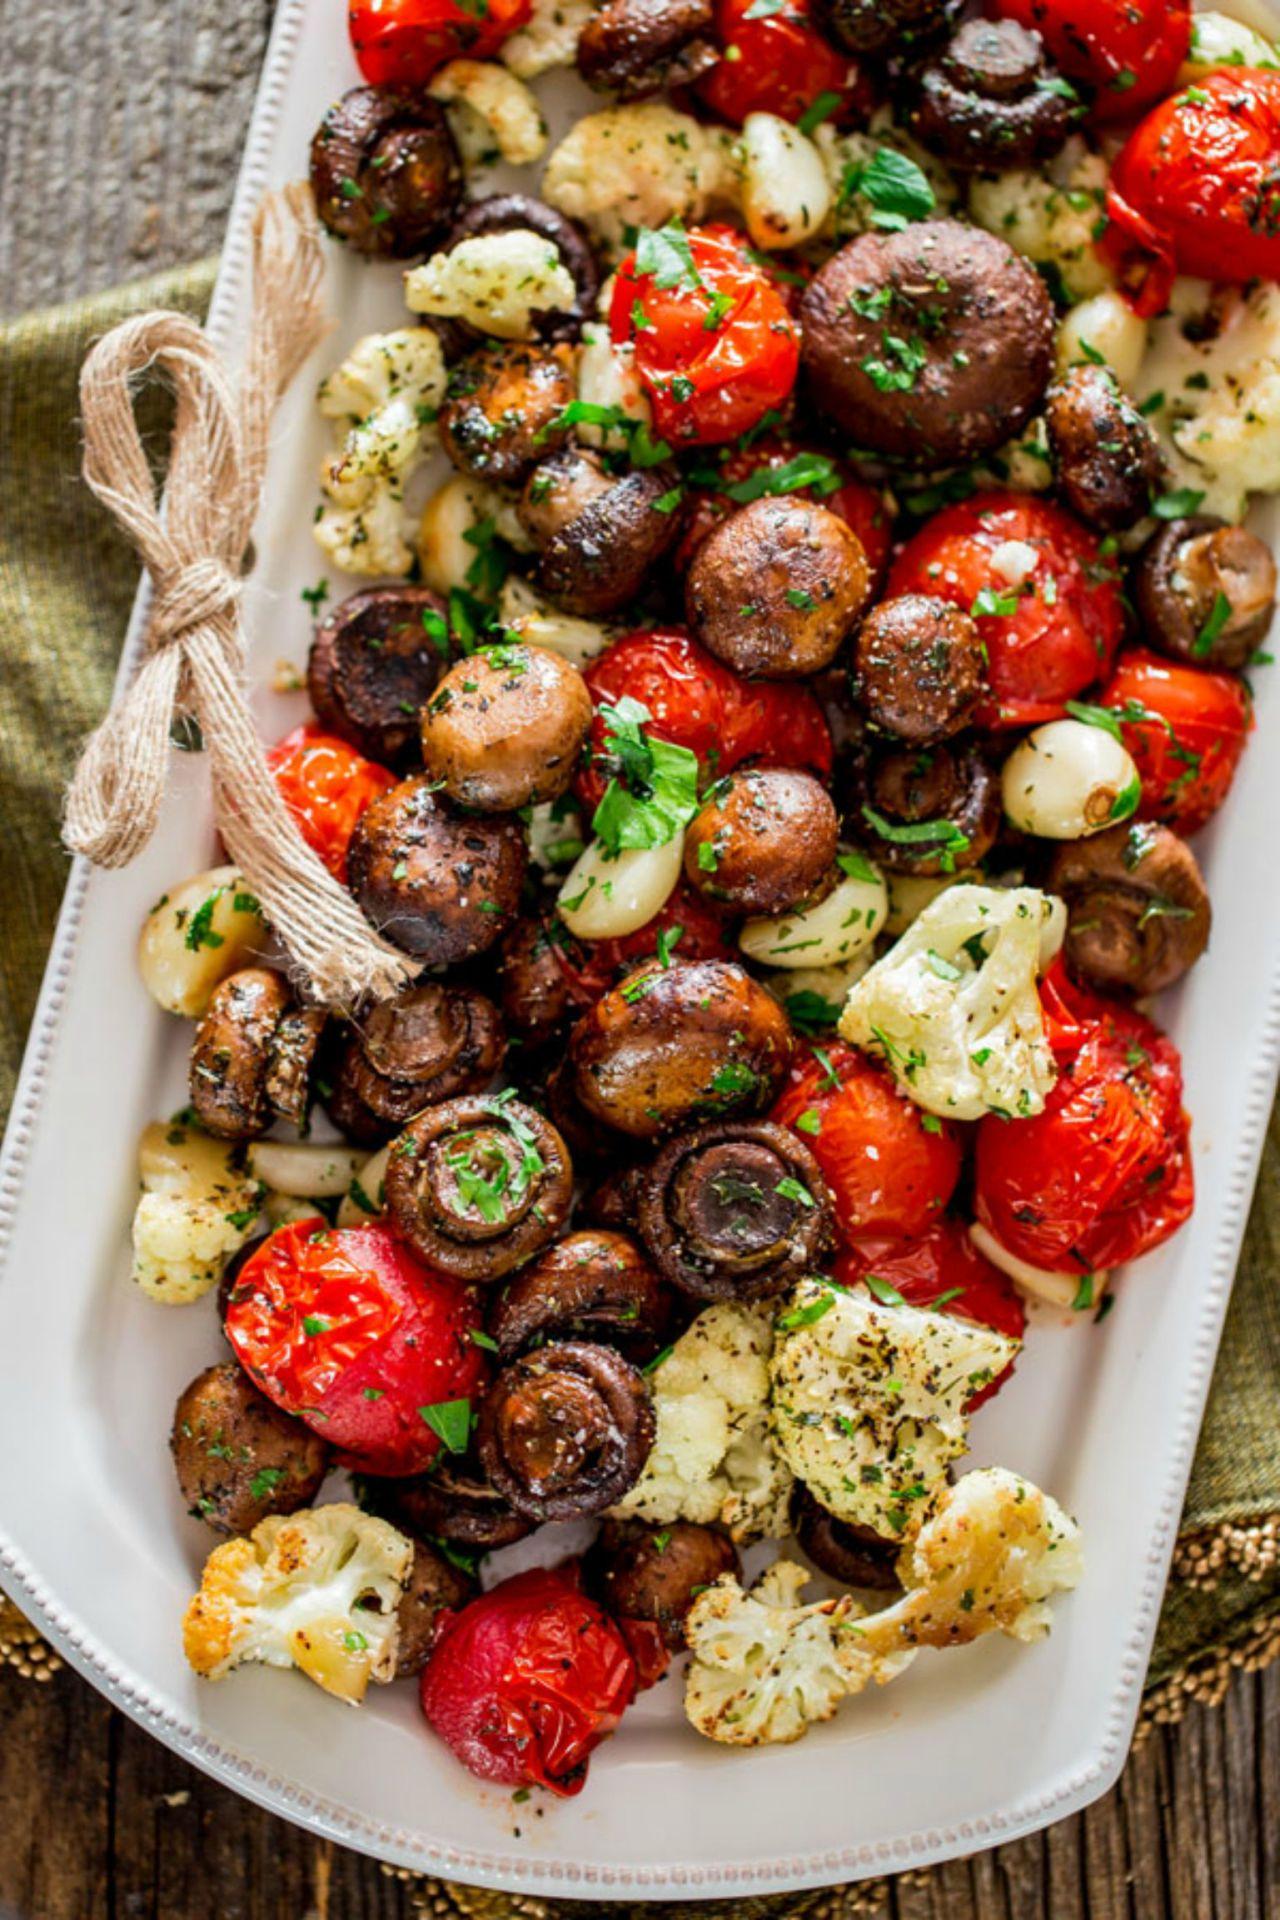 italian roasted mushrooms and veggies womansdaycom xmas dinnerdinner - Best Christmas Dinner Recipes